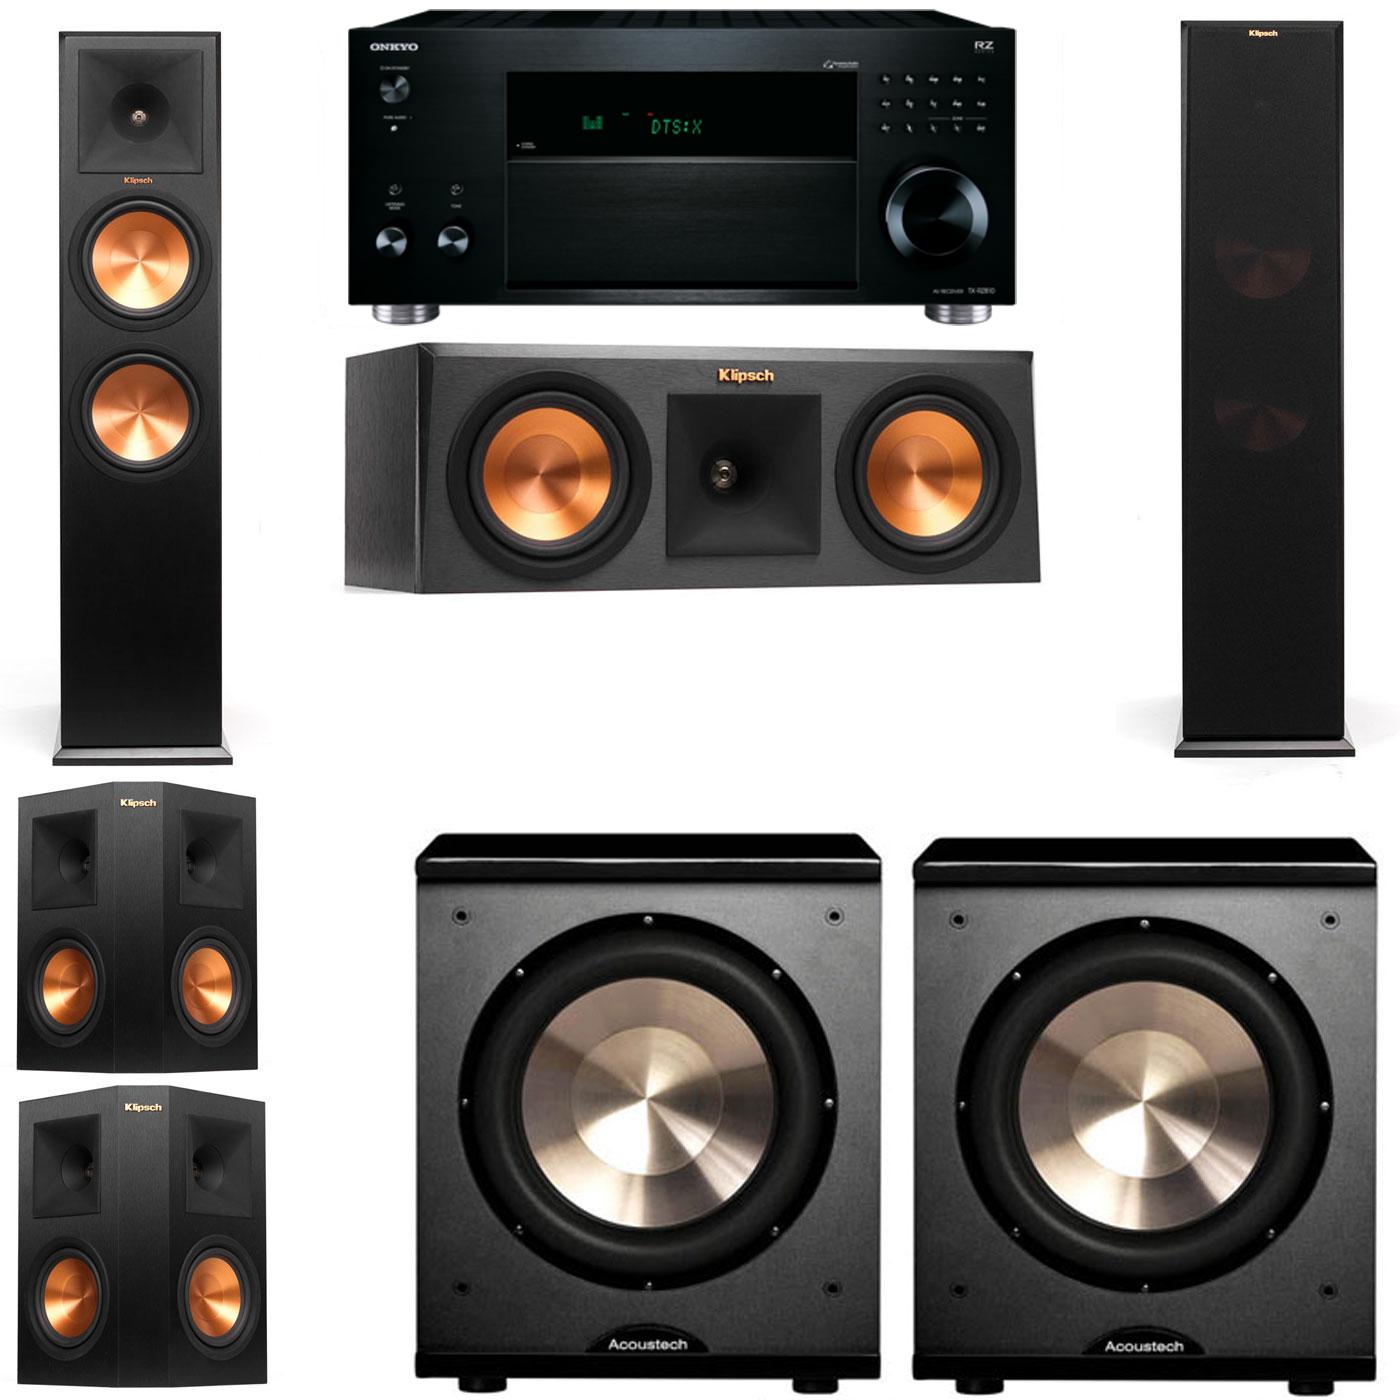 Klipsch RP-280F Tower Speakers-RP-250C-PL-200-5.2-Onkyo TX-RZ810